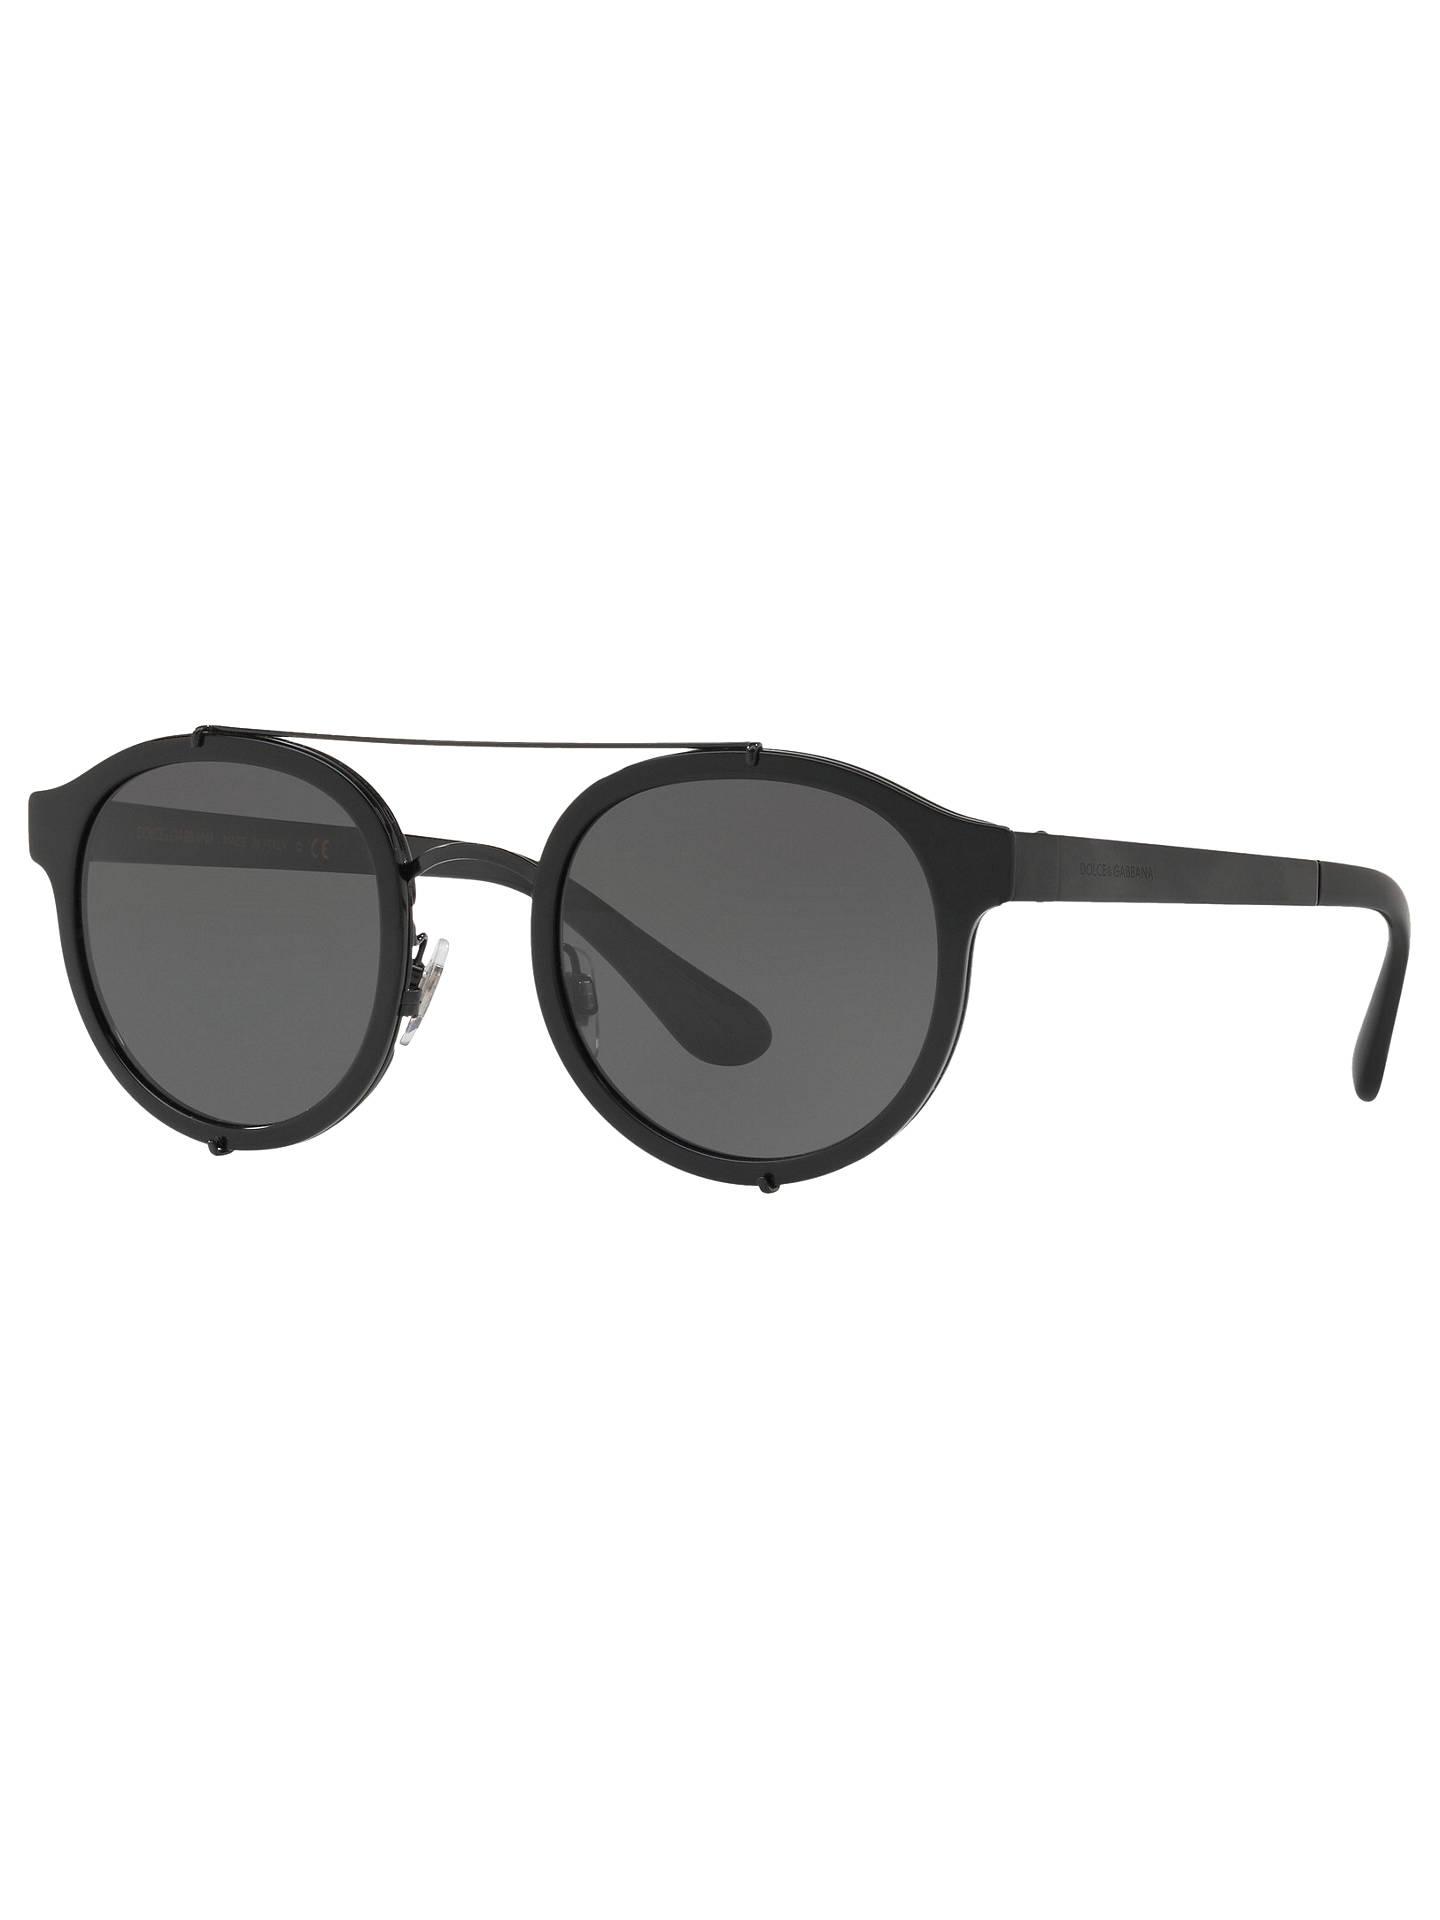 5cd04dba6b BuyDolce   Gabbana DG2184 Oval Sunglasses